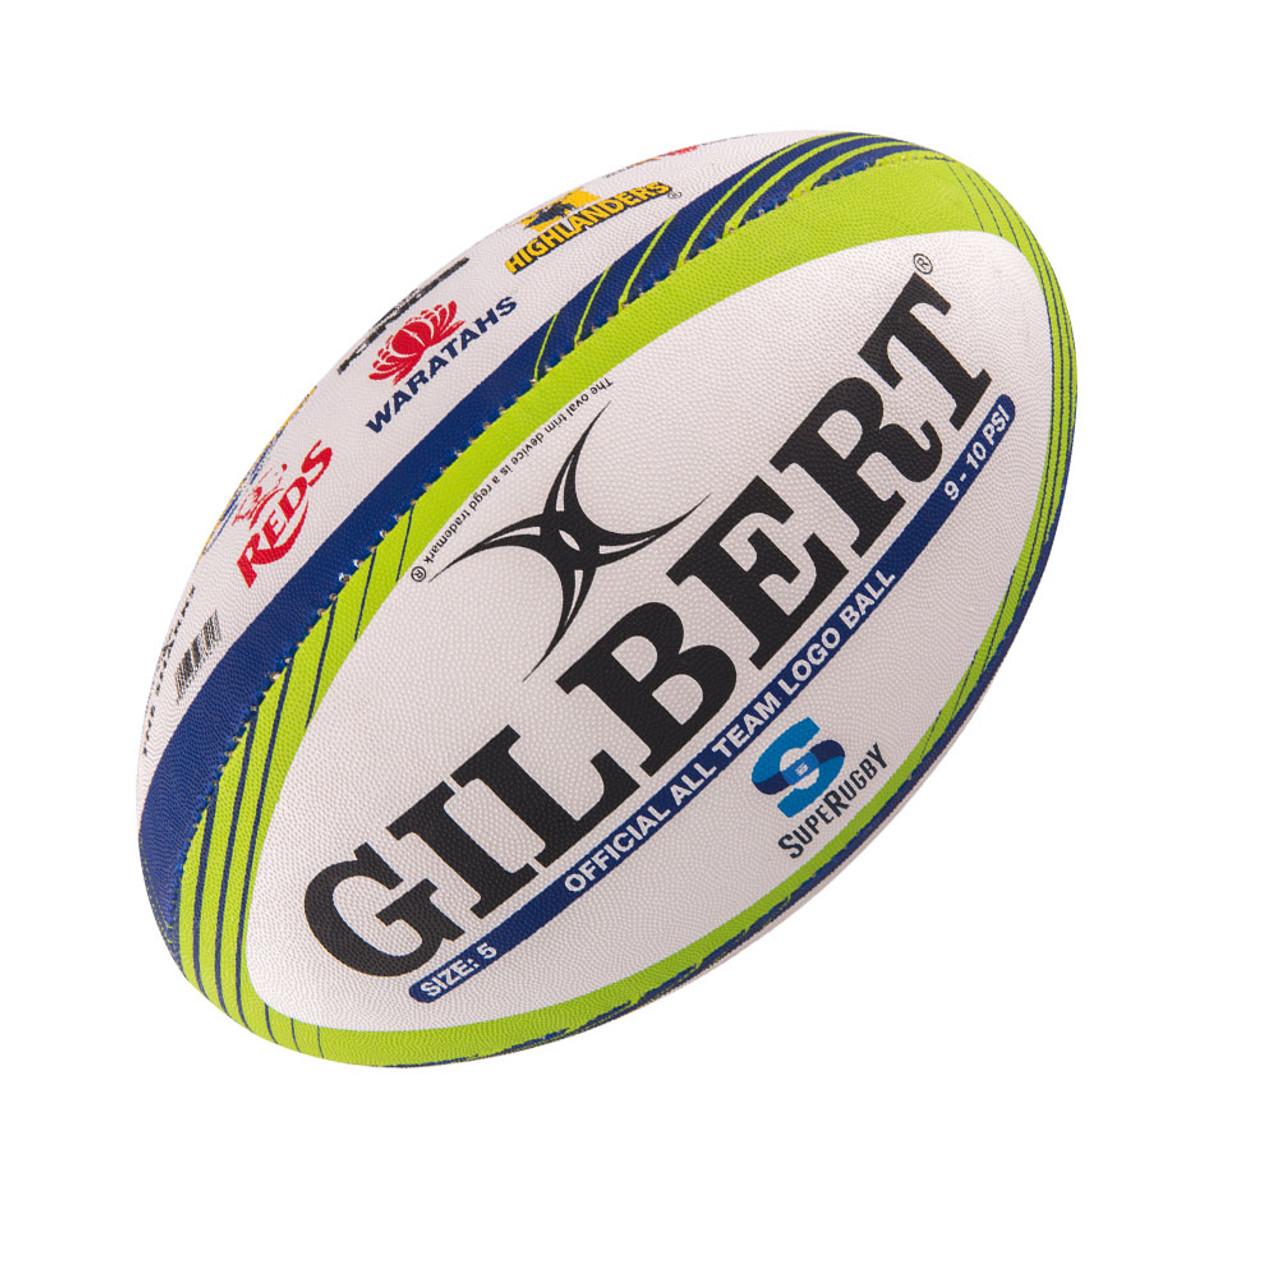 6c6c1486e38 Super-rugby-logo  91917.1544115361.jpg c 2 imbypass on